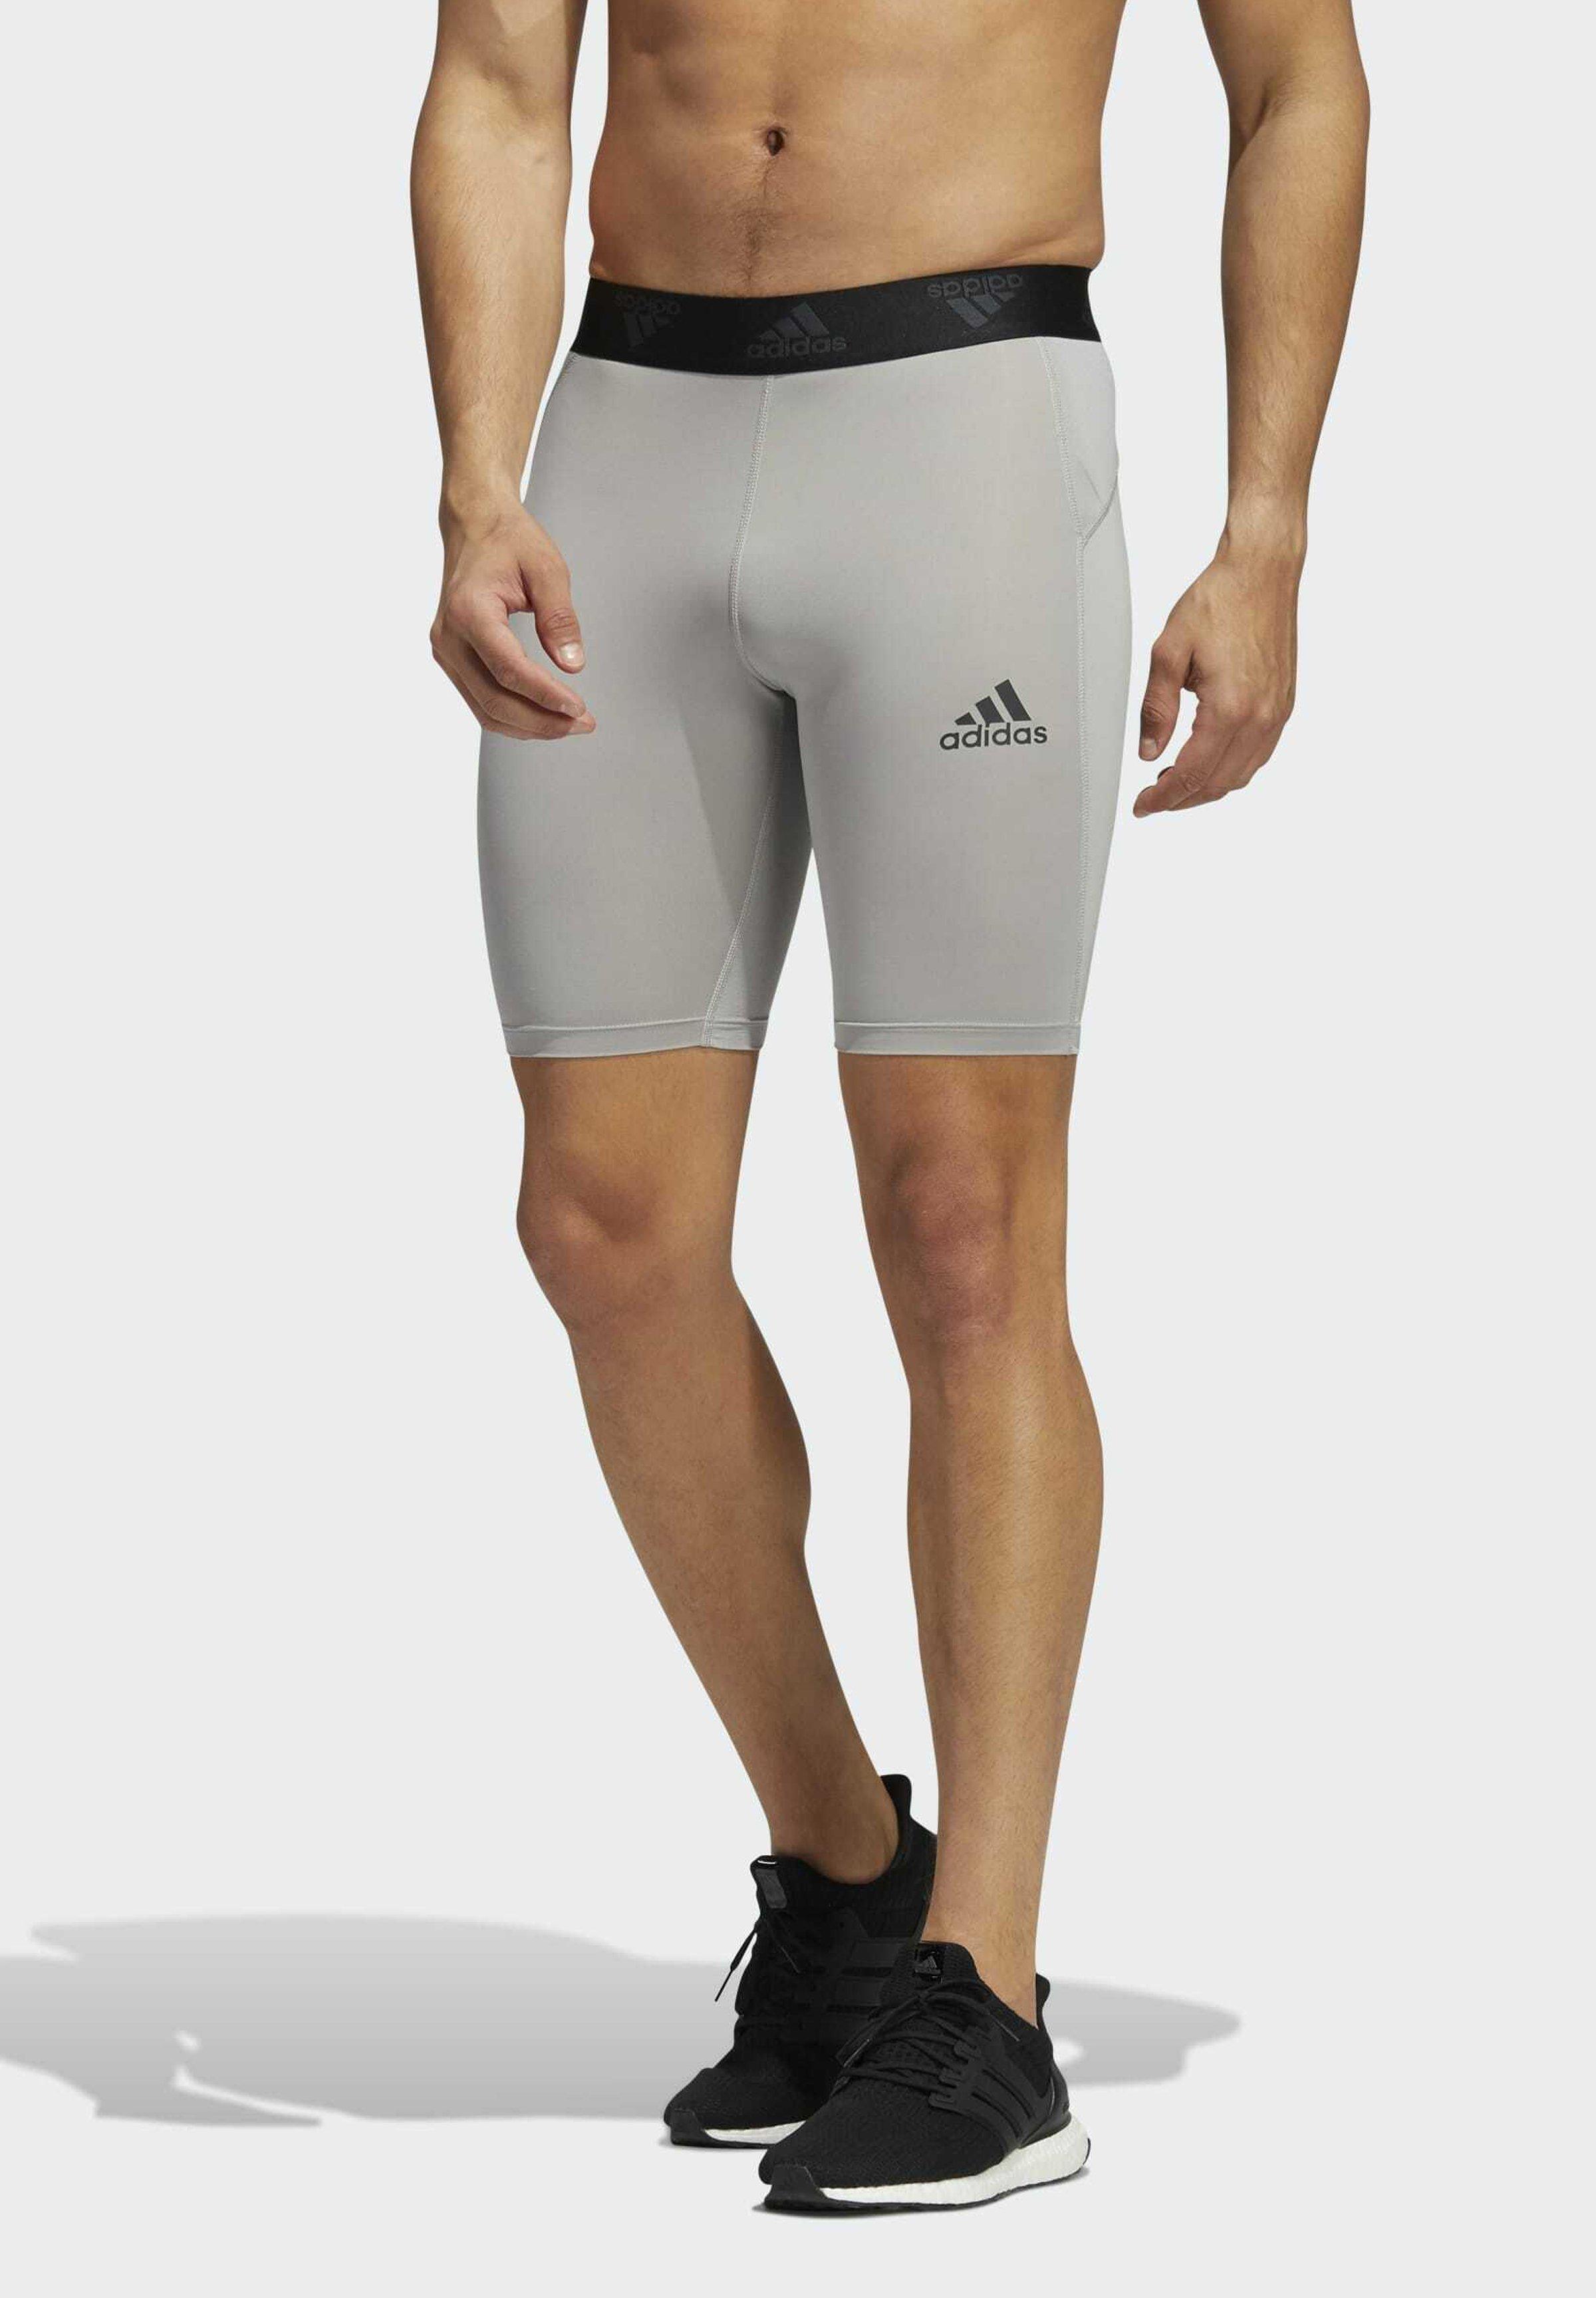 Men TURF TRAINING WORKOUT TECH-FIT AEROREADY PRIMEGREEN TECHFIT SHORT LEGGINGS COMPRESSION - Shorts